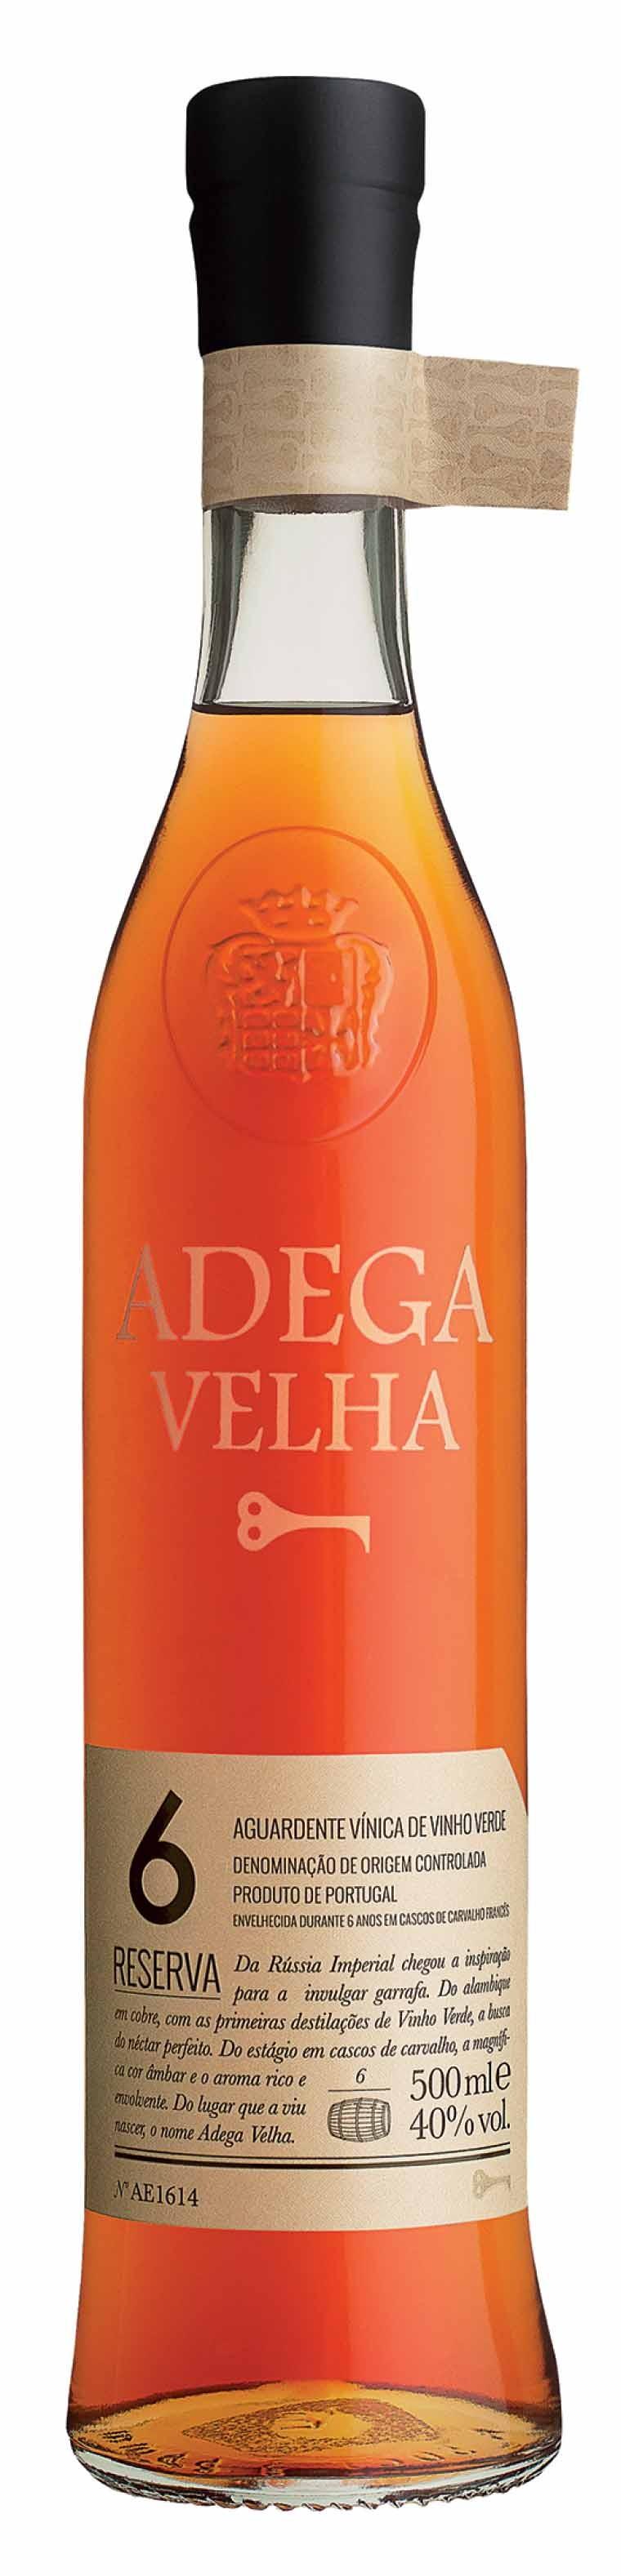 Adega Velha Aguardente 6 Years Old